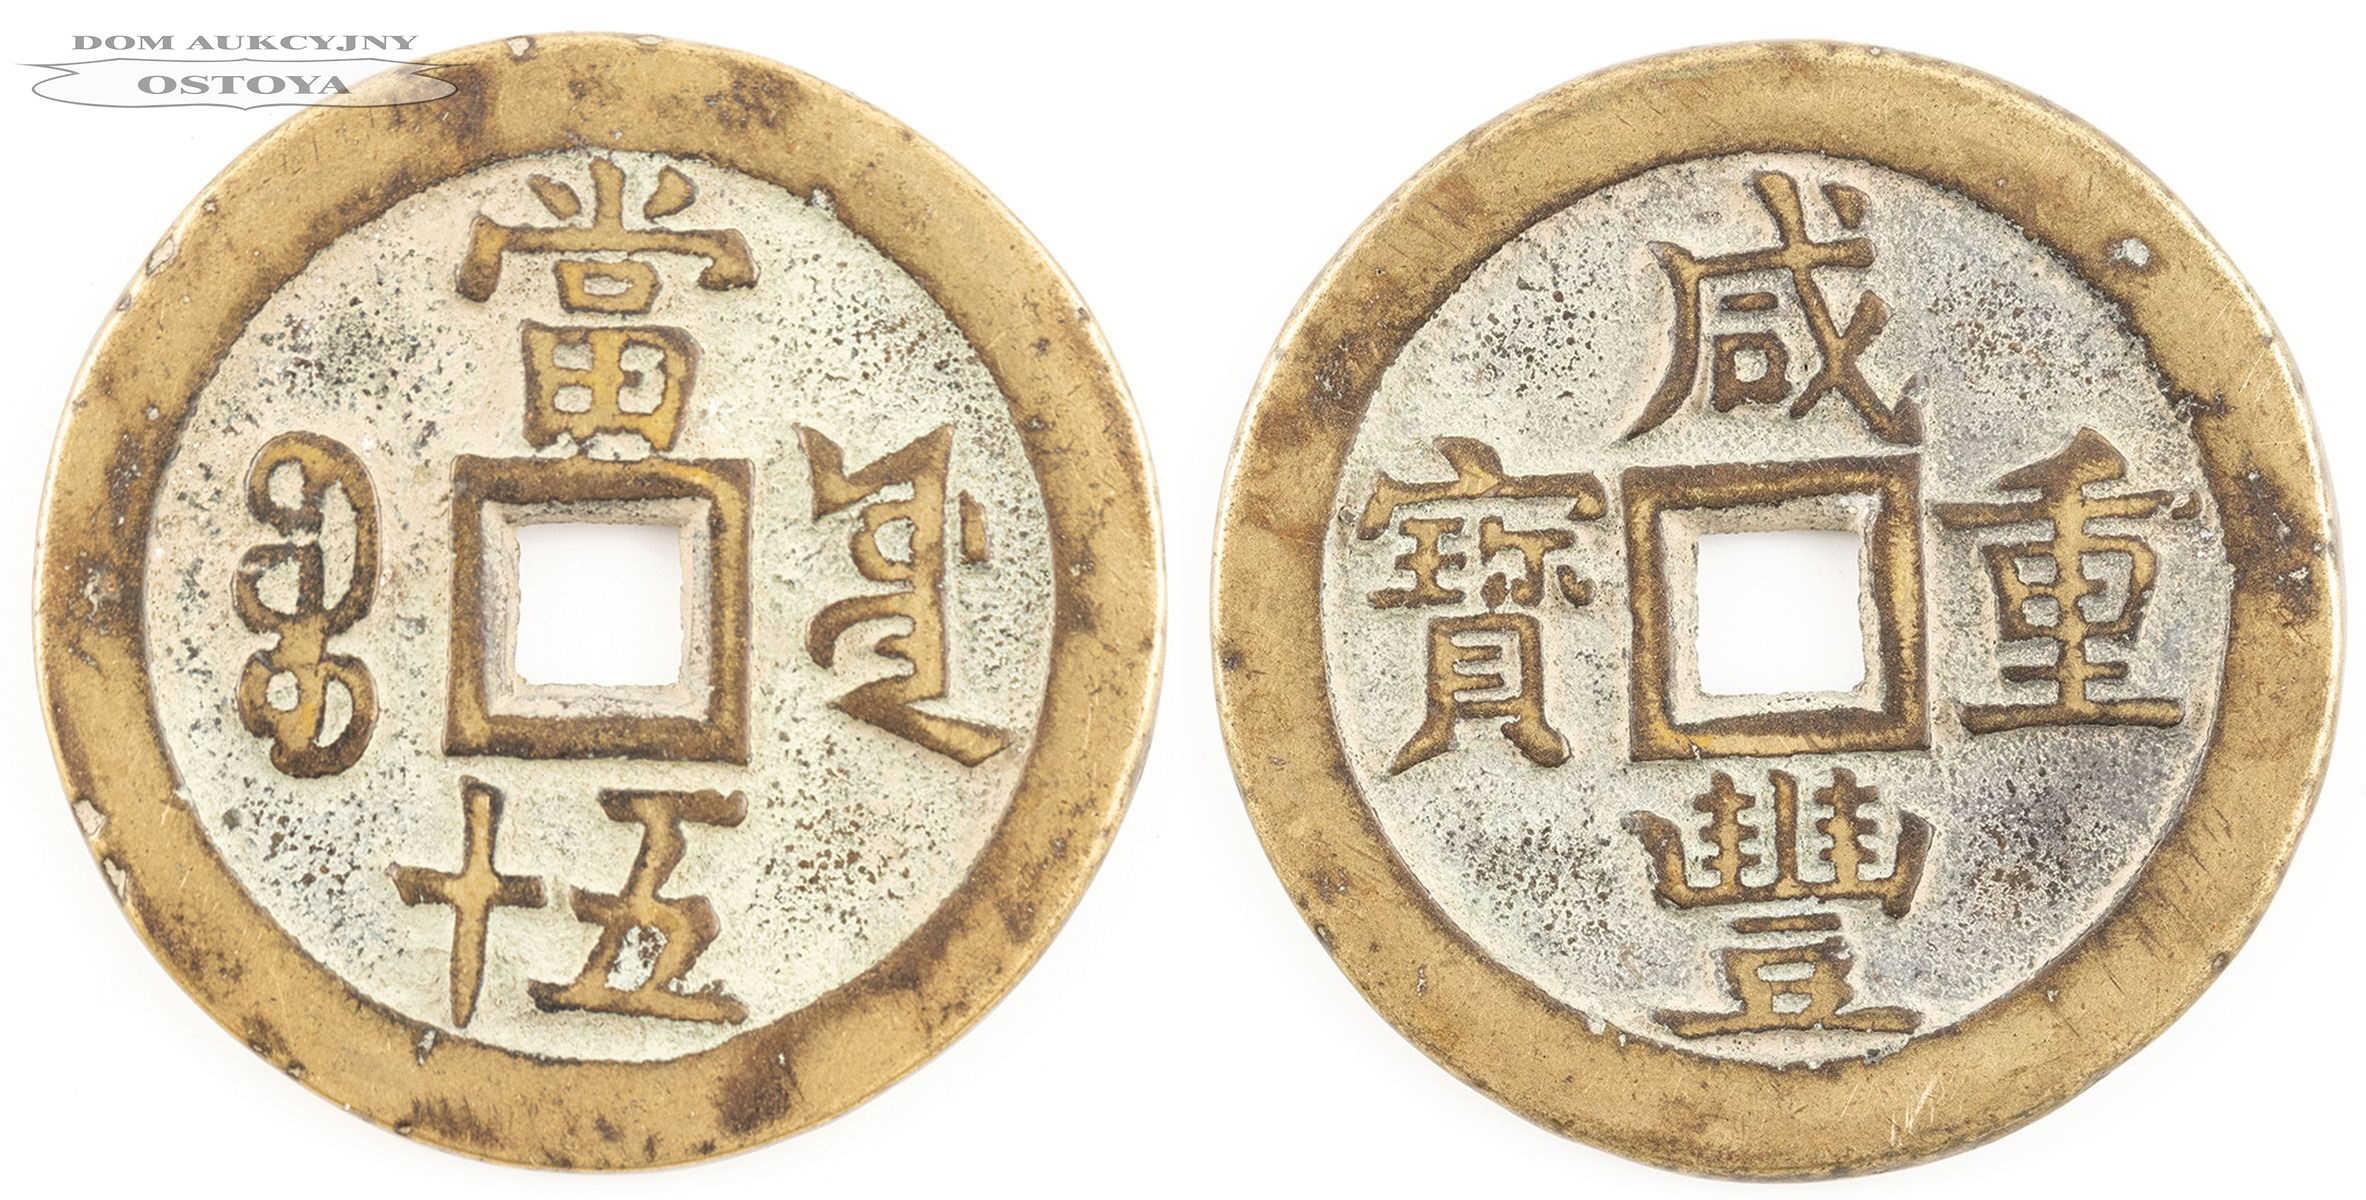 MONETA KESZOWA, 500 KESZÓW, Chiny cesarz Xianfeng , Bao Quan, ok. 1854-55